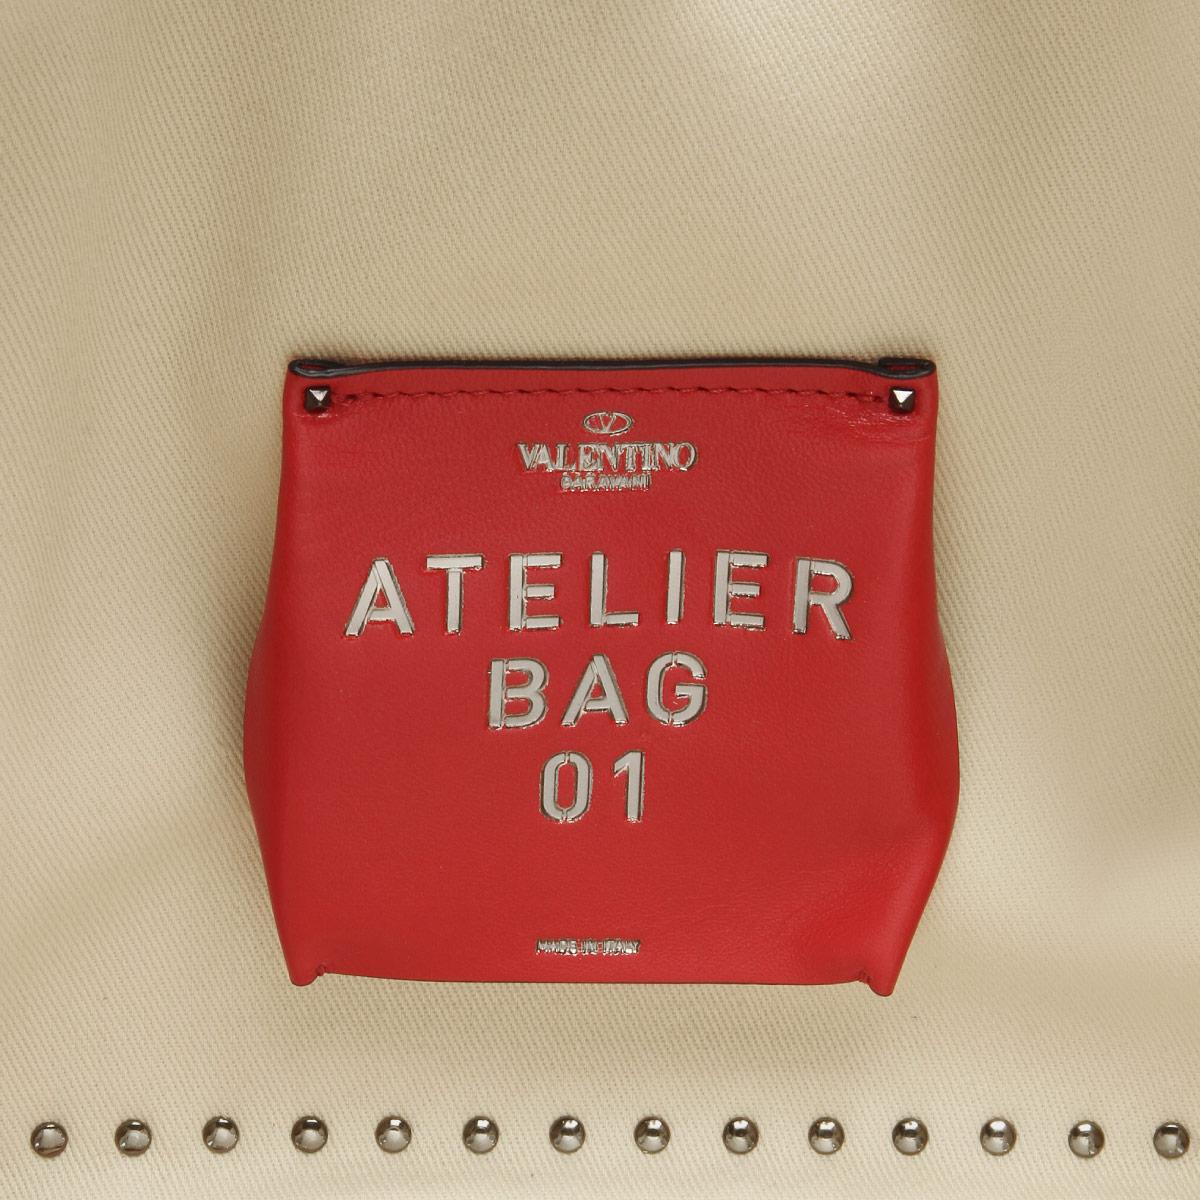 VALENTINO ヴァレンティノ | ショルダー付 トートバッグ スモール | ATELIER アトリエ